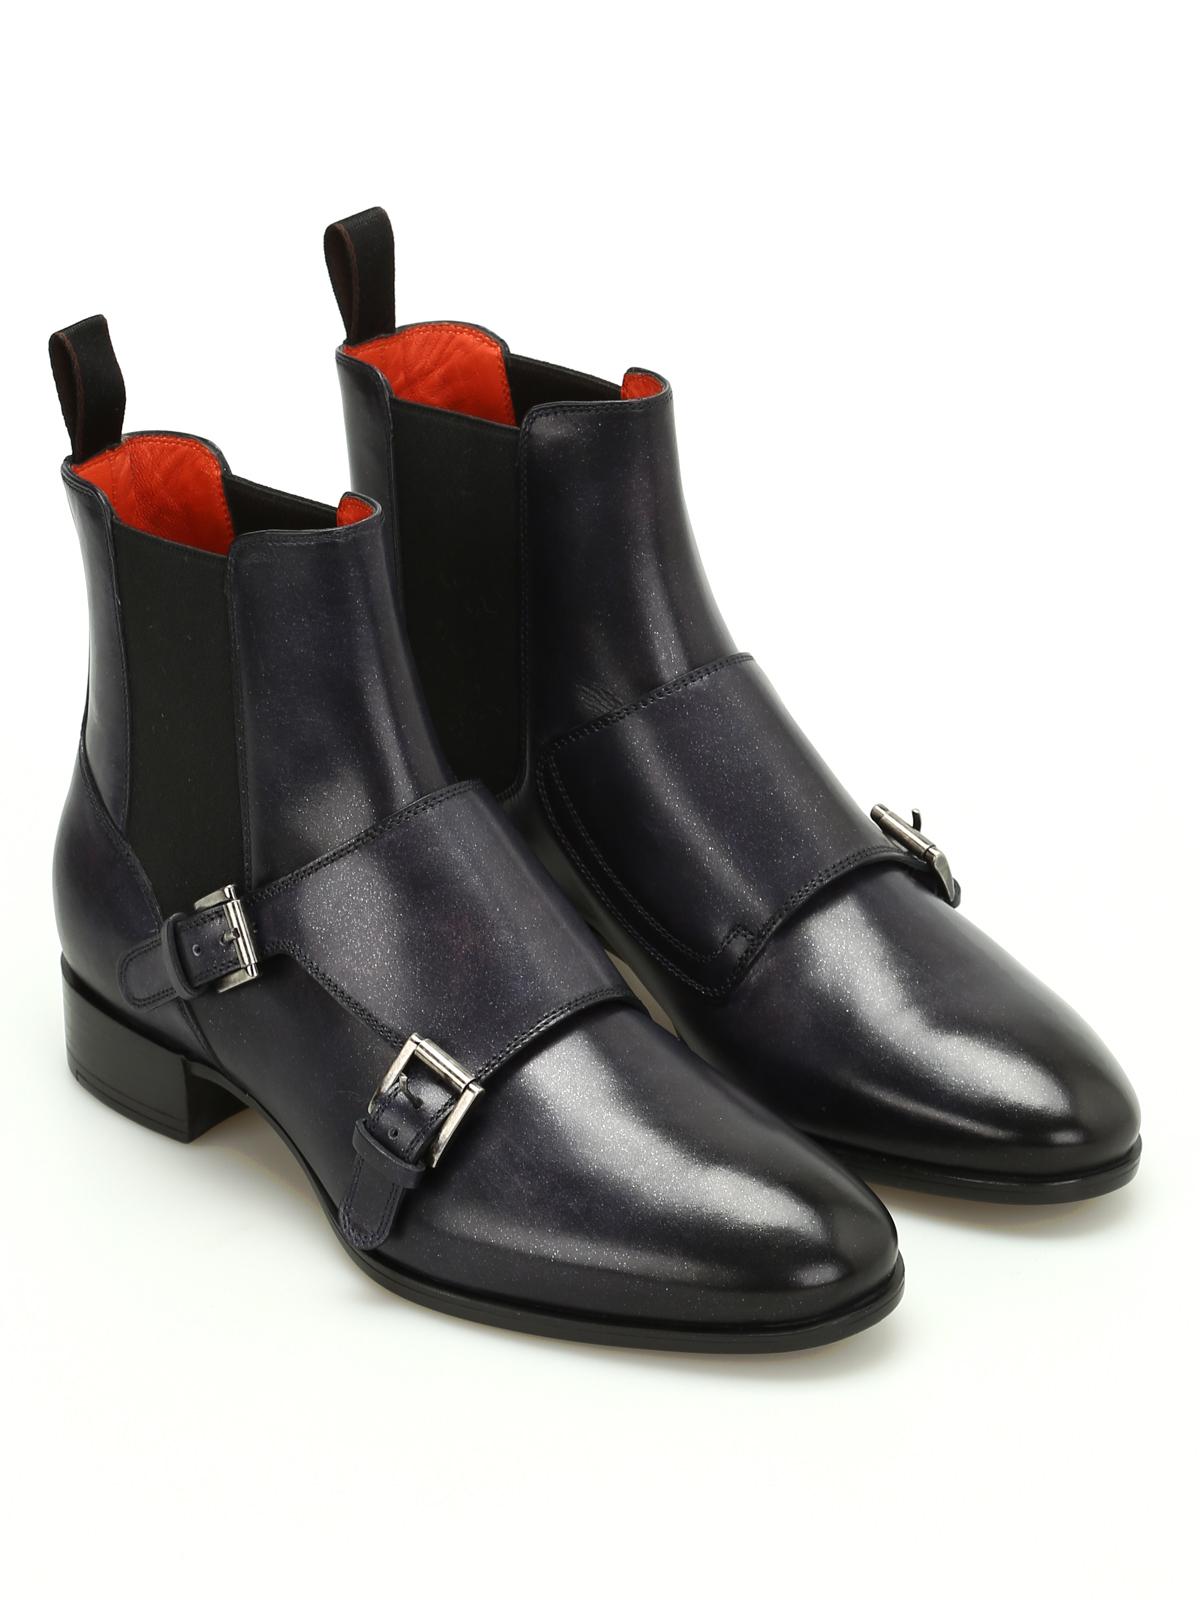 c12321e8f5ab2f SANTONI  ankle boots online - Monk strap leather Chelsea boots